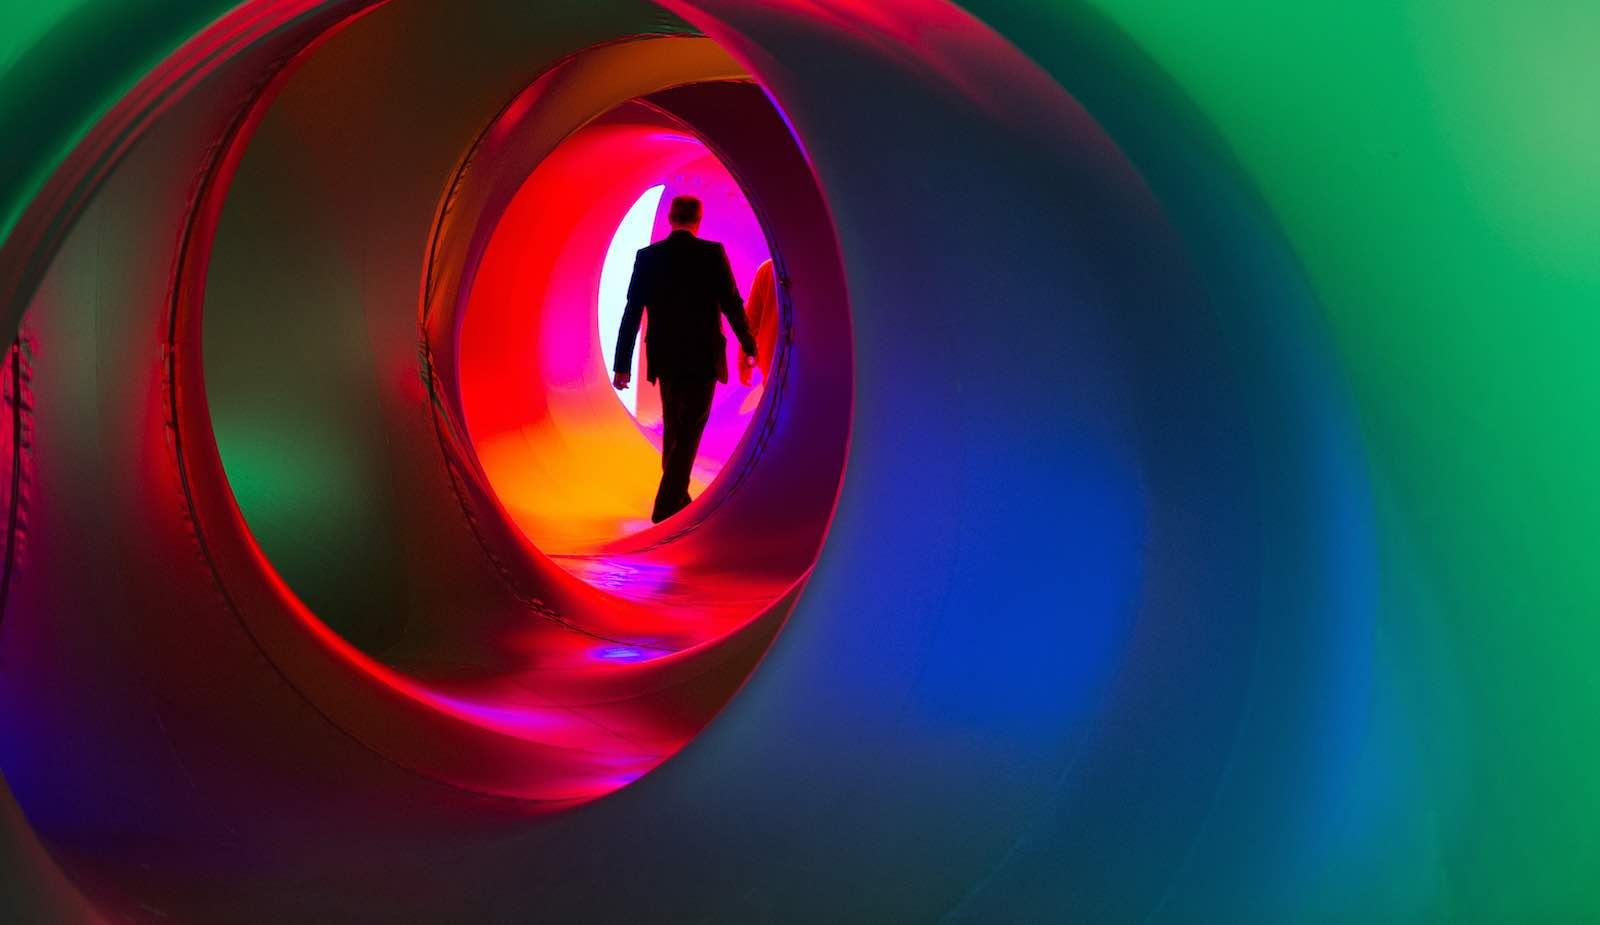 """Luminarium"", an inflatable sculpture by British artist Alan Parkinson (Photo: UN Photos)"